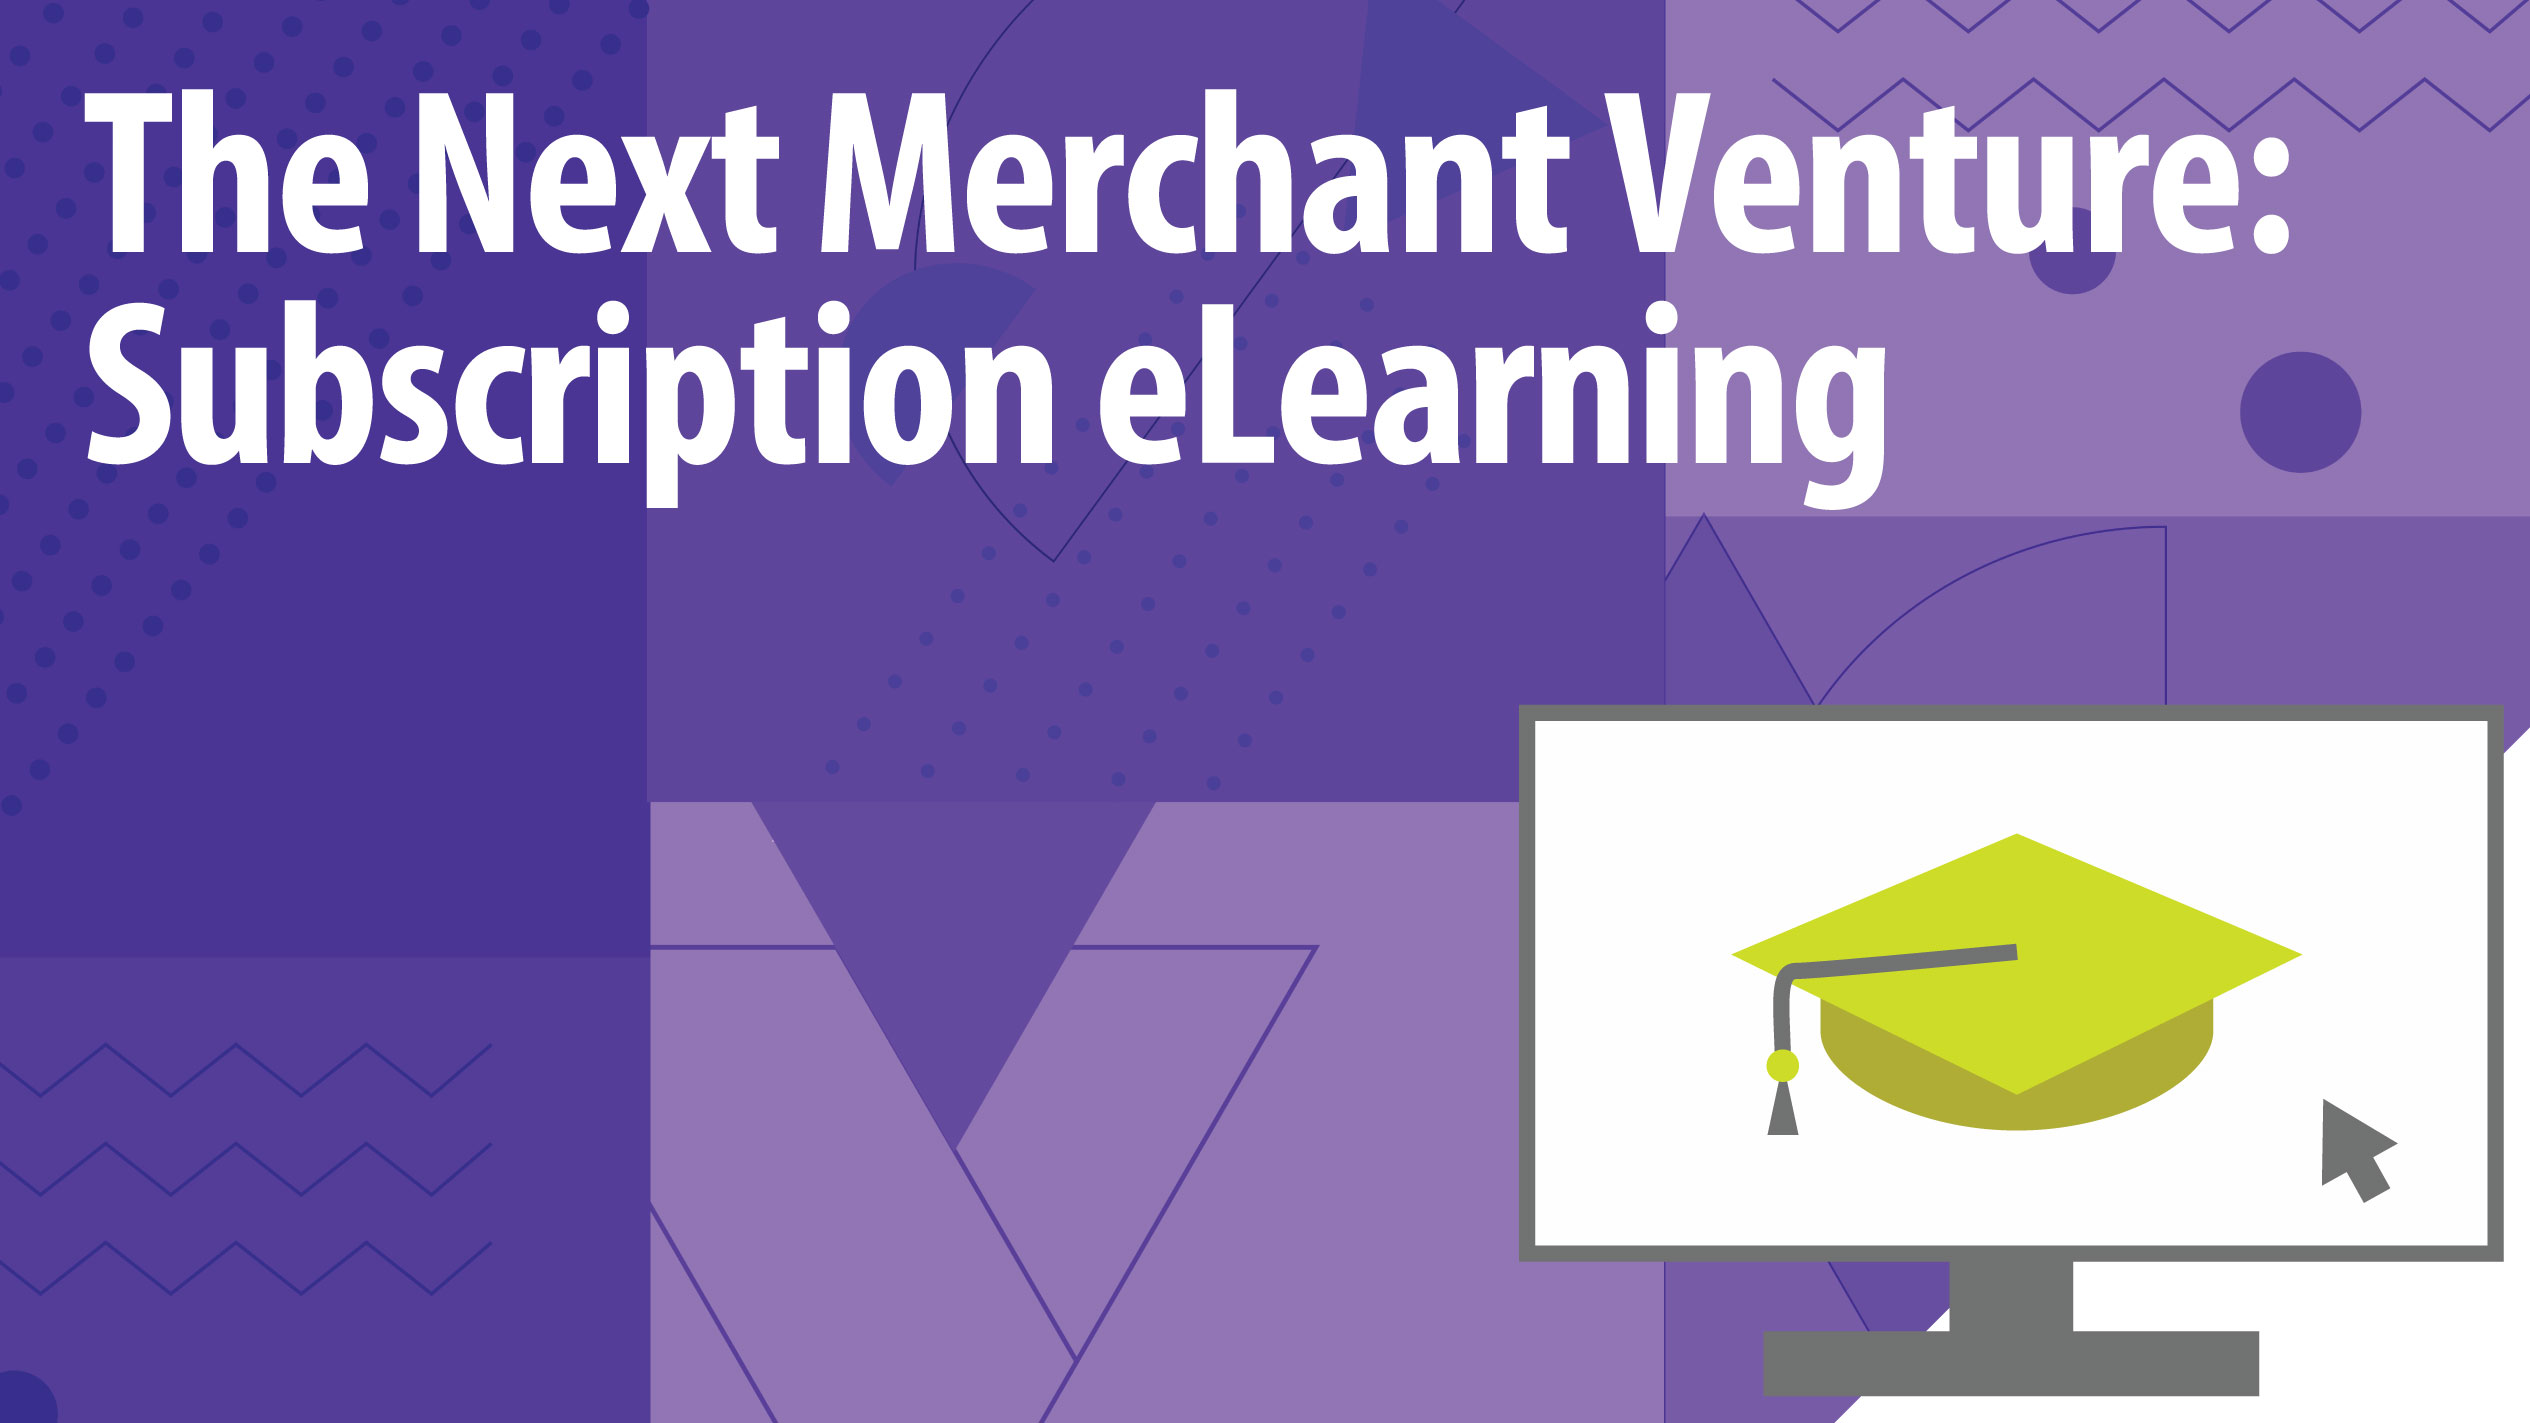 The Next Merchant Venture: Subscription eLearning